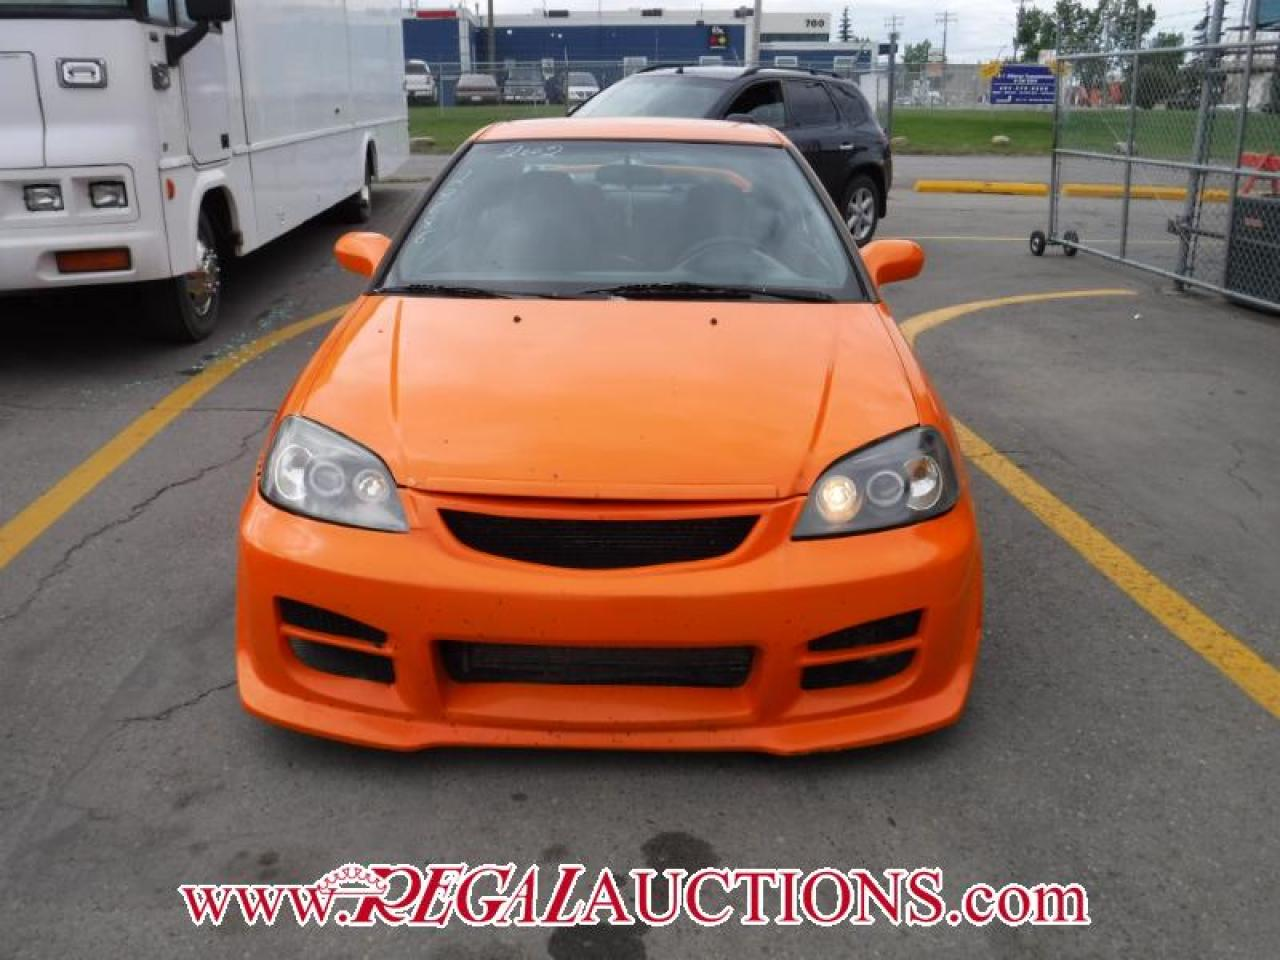 Photo of Orange 2002 Honda Civic